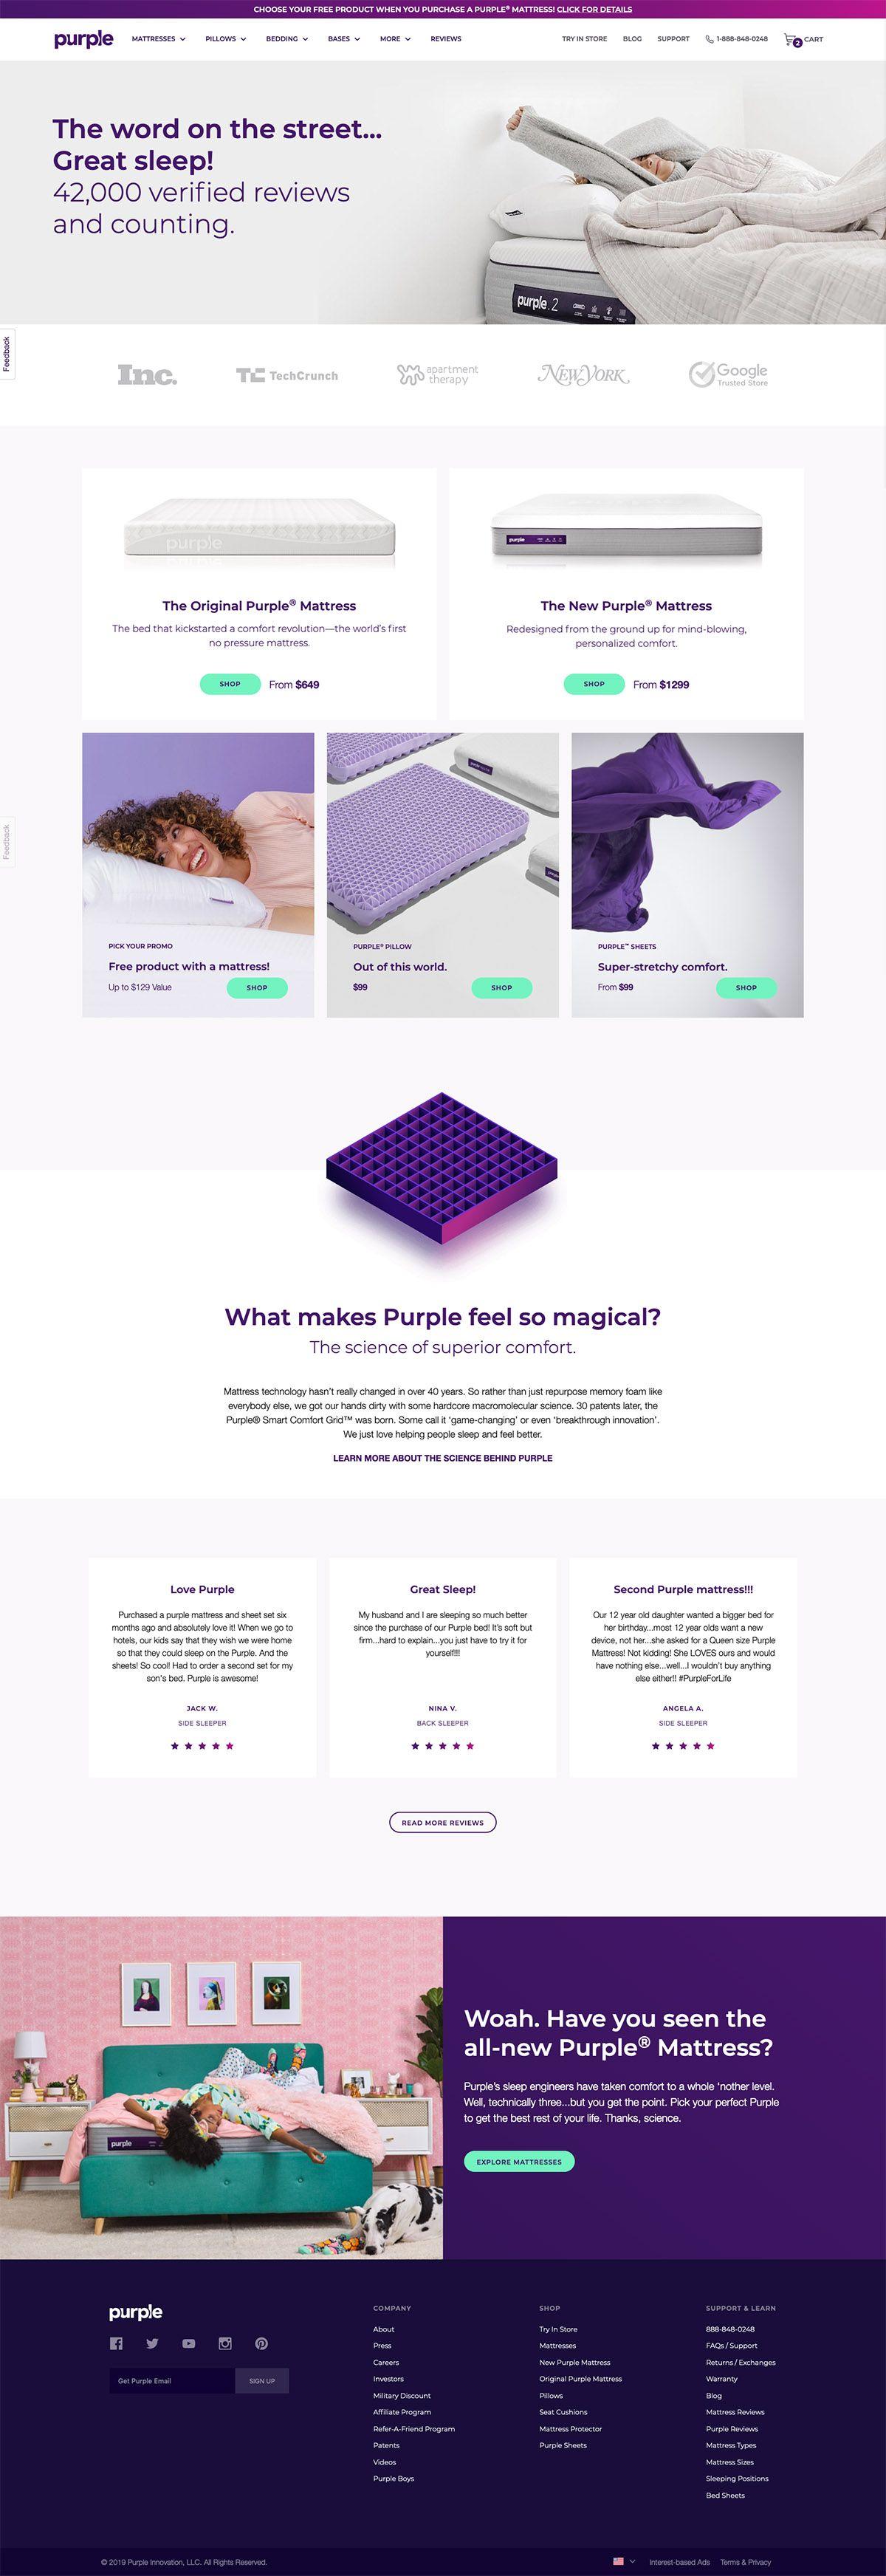 eCommerce website: Purple